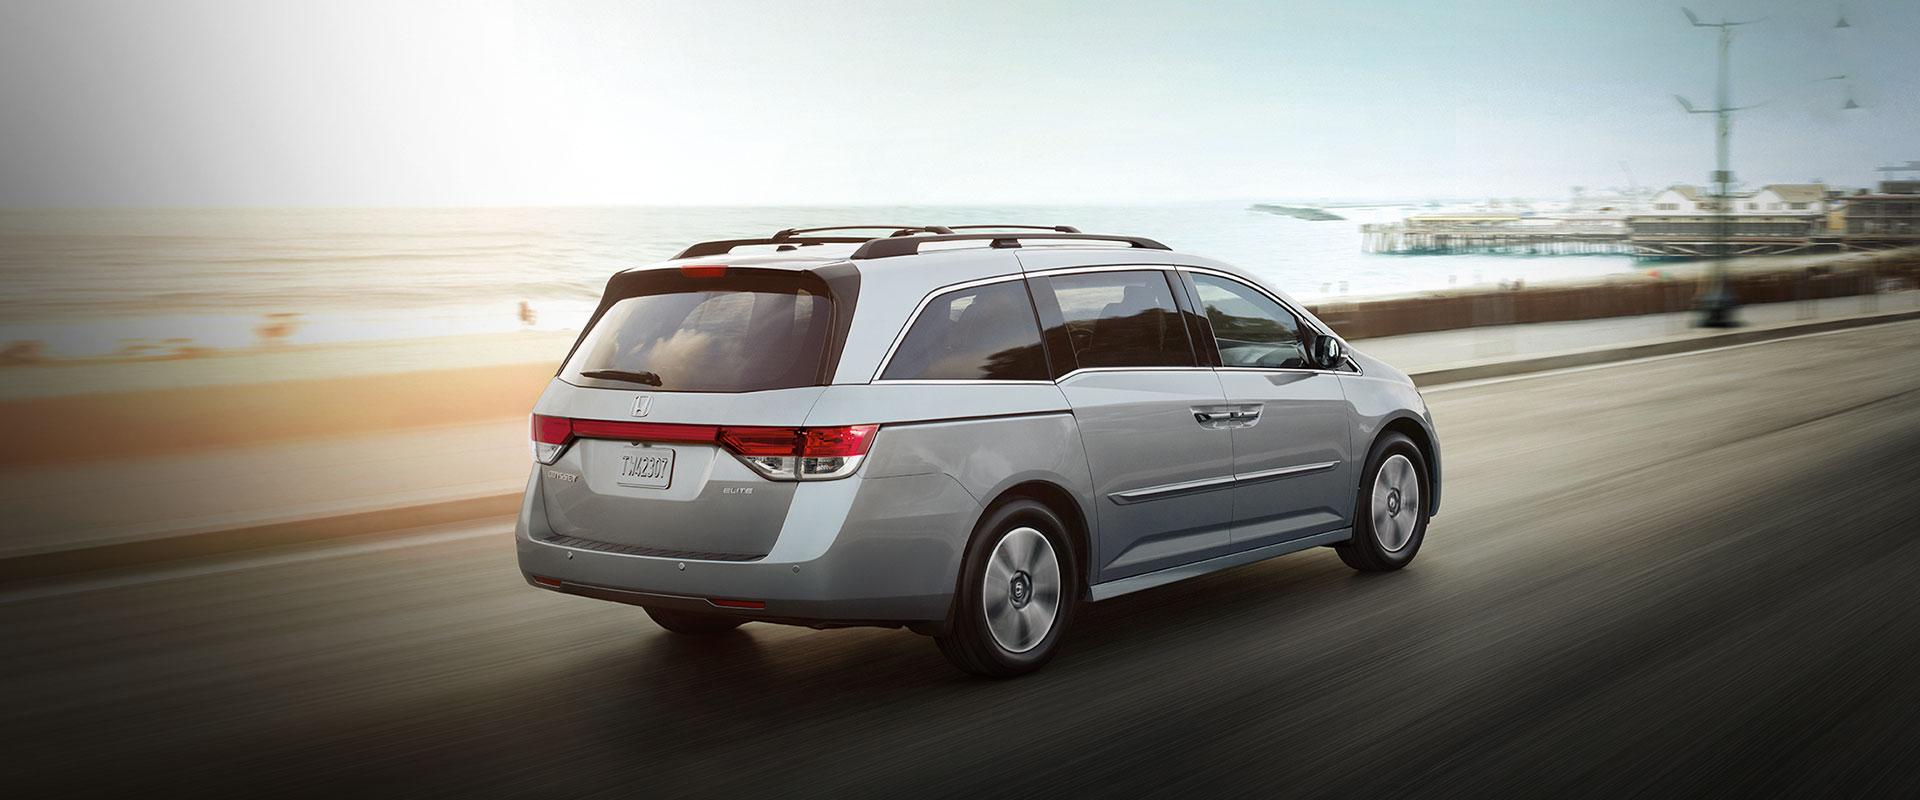 2017 Honda Odyssey back passenger side view